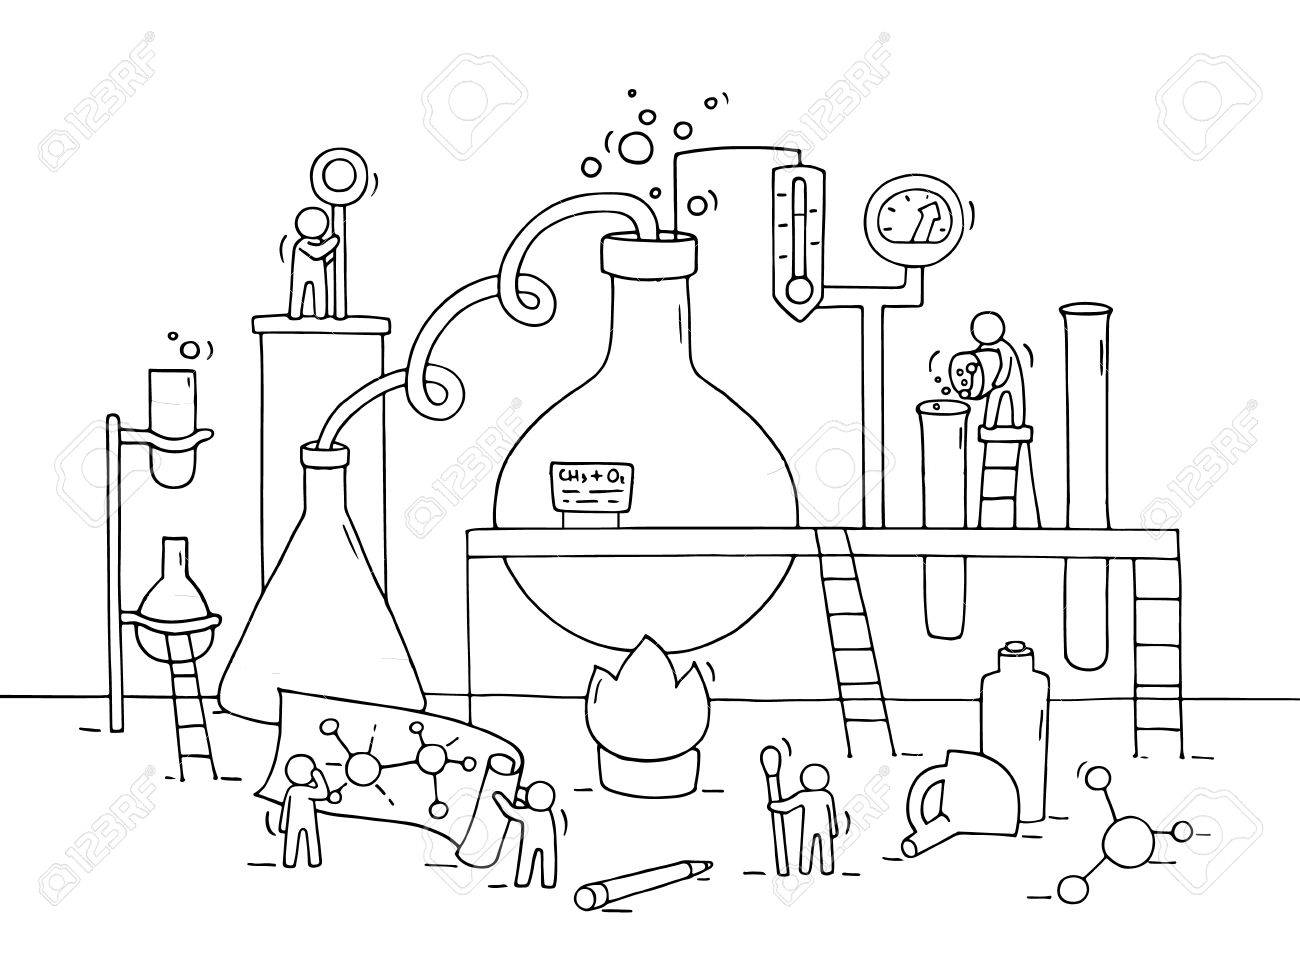 Science beaker drawing at getdrawings free for personal use science beaker drawing 40 science beaker drawing